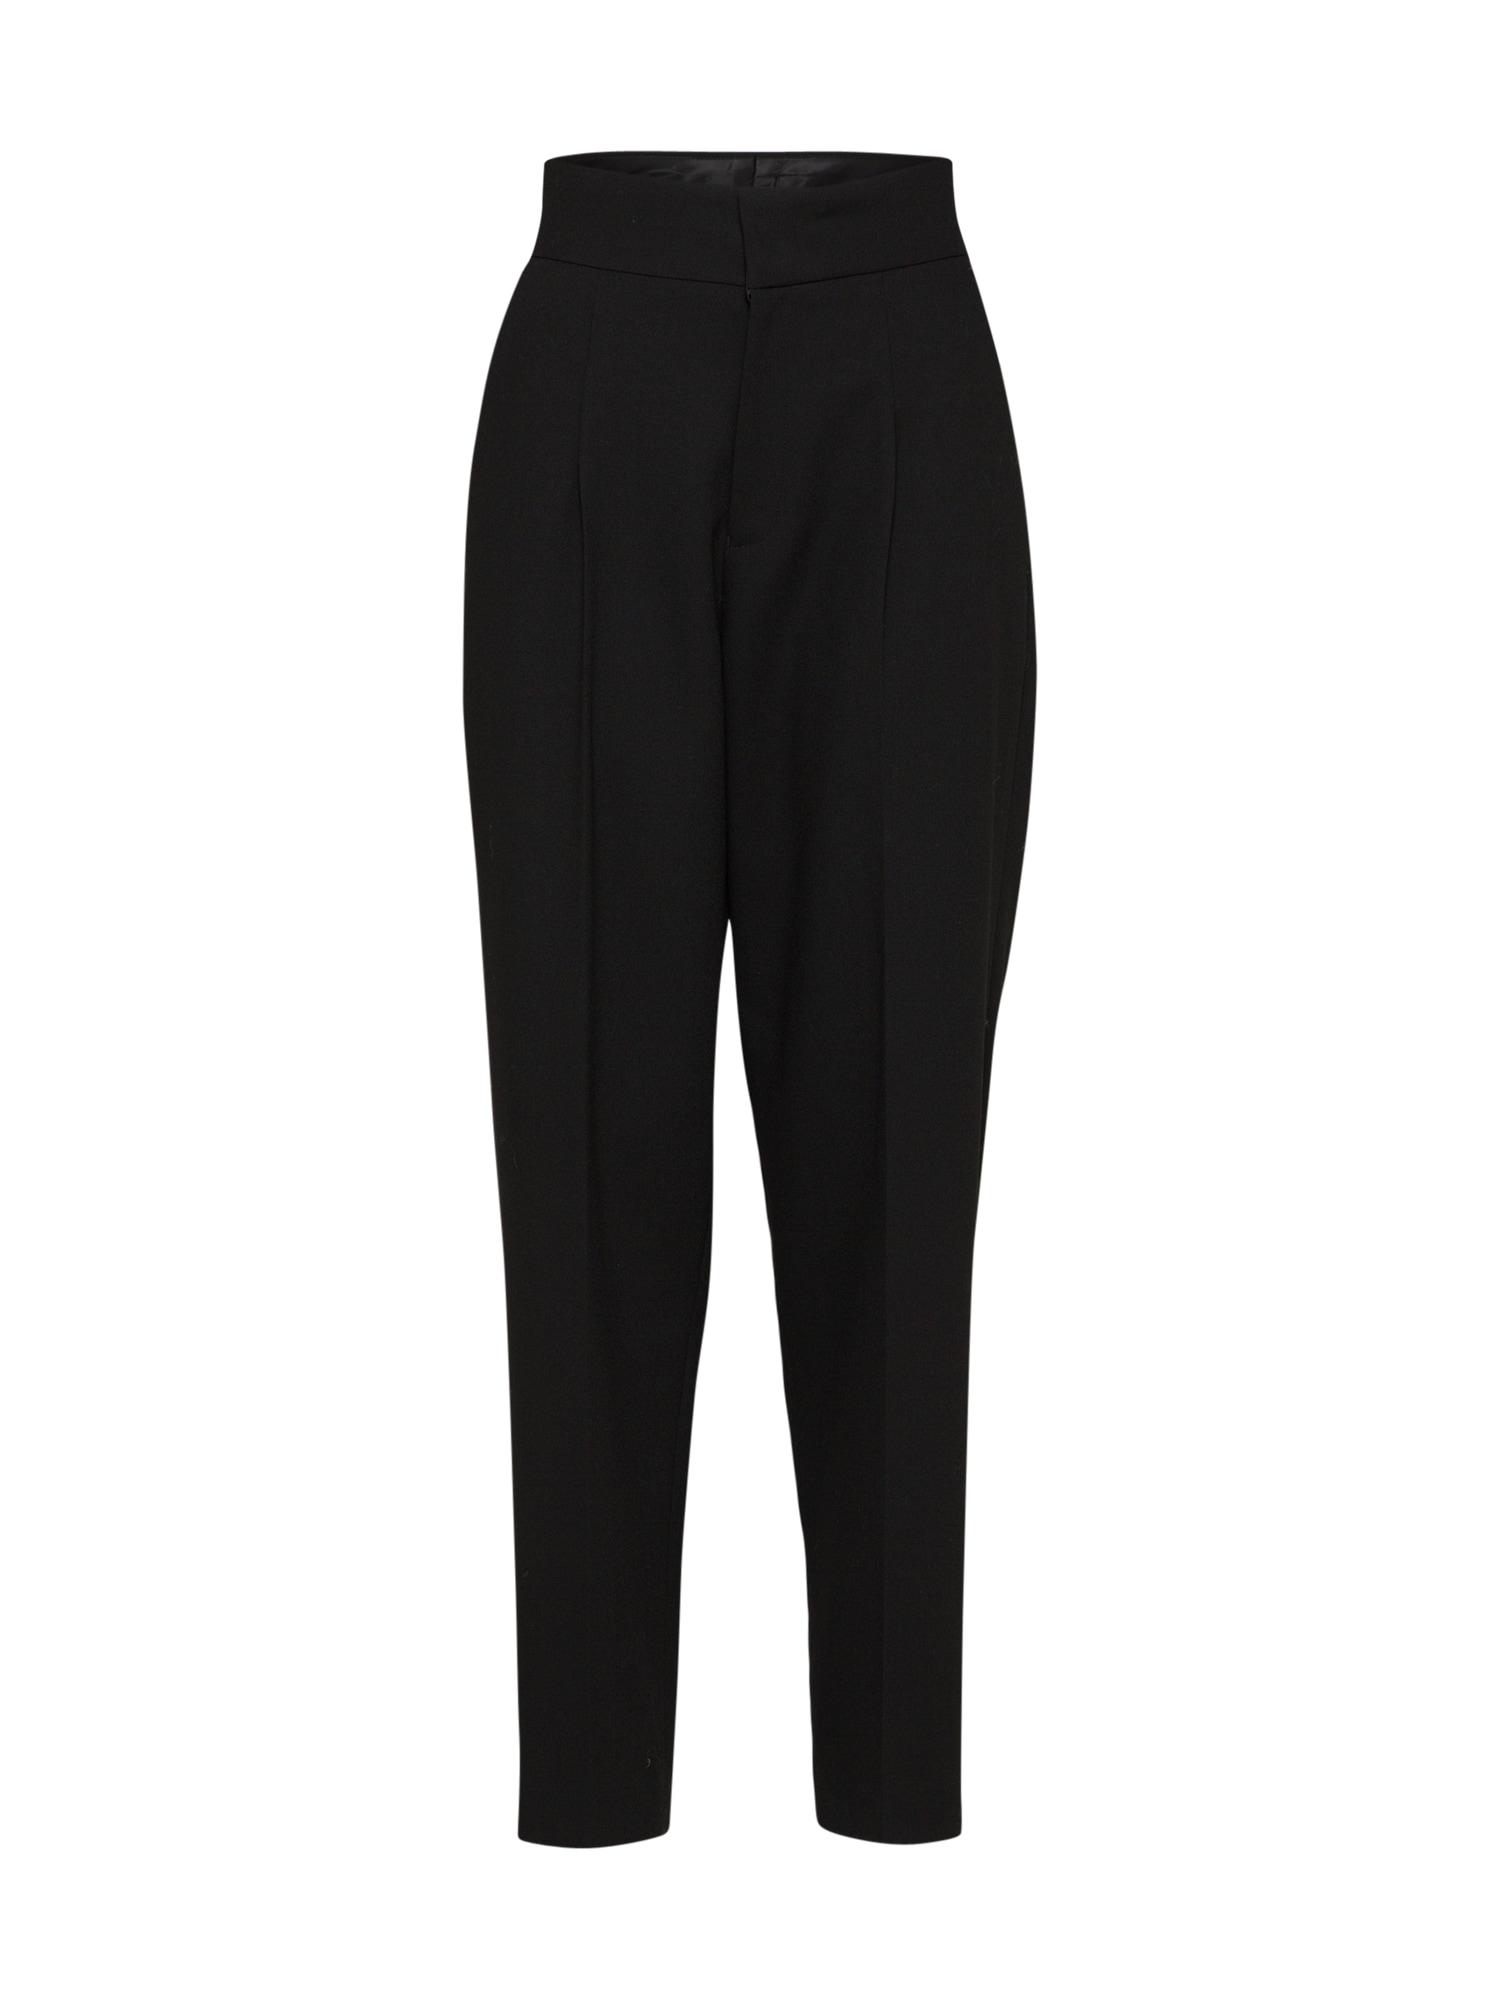 Kalhoty se sklady v pase Posagara černá POSTYR